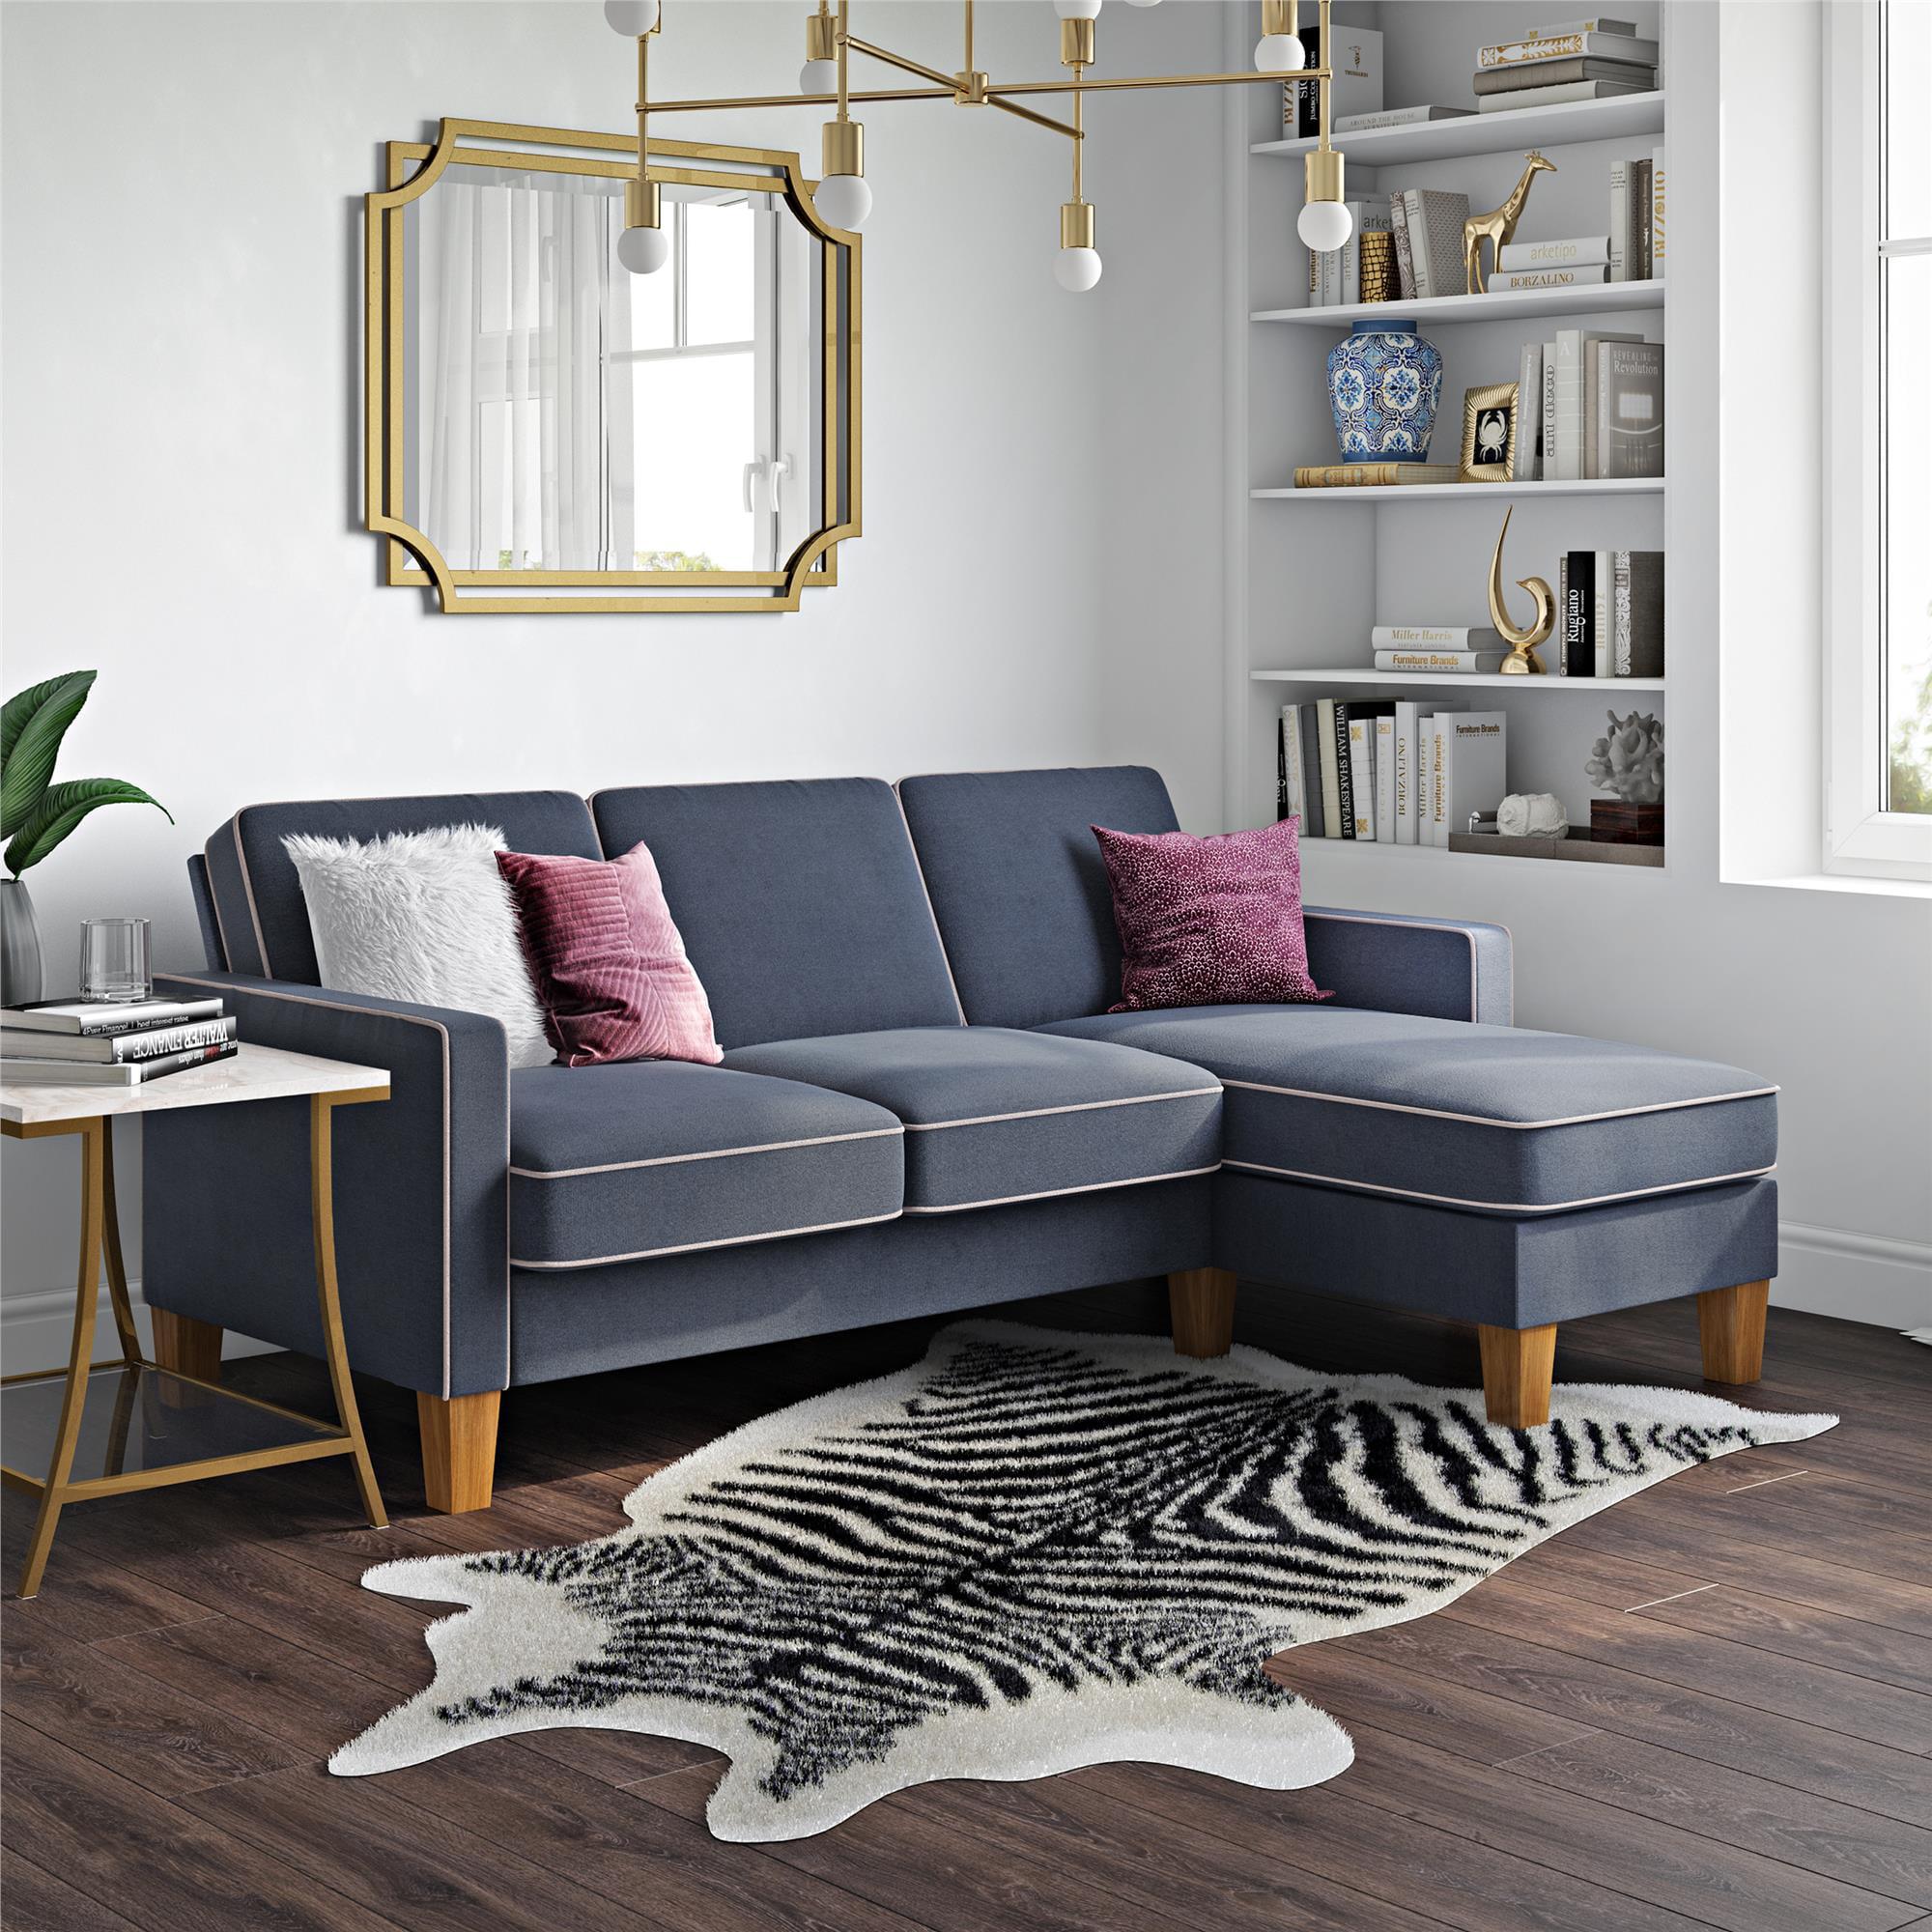 Novogratz Bowen Sectional Sofa with Contrast Welting, Blue ...